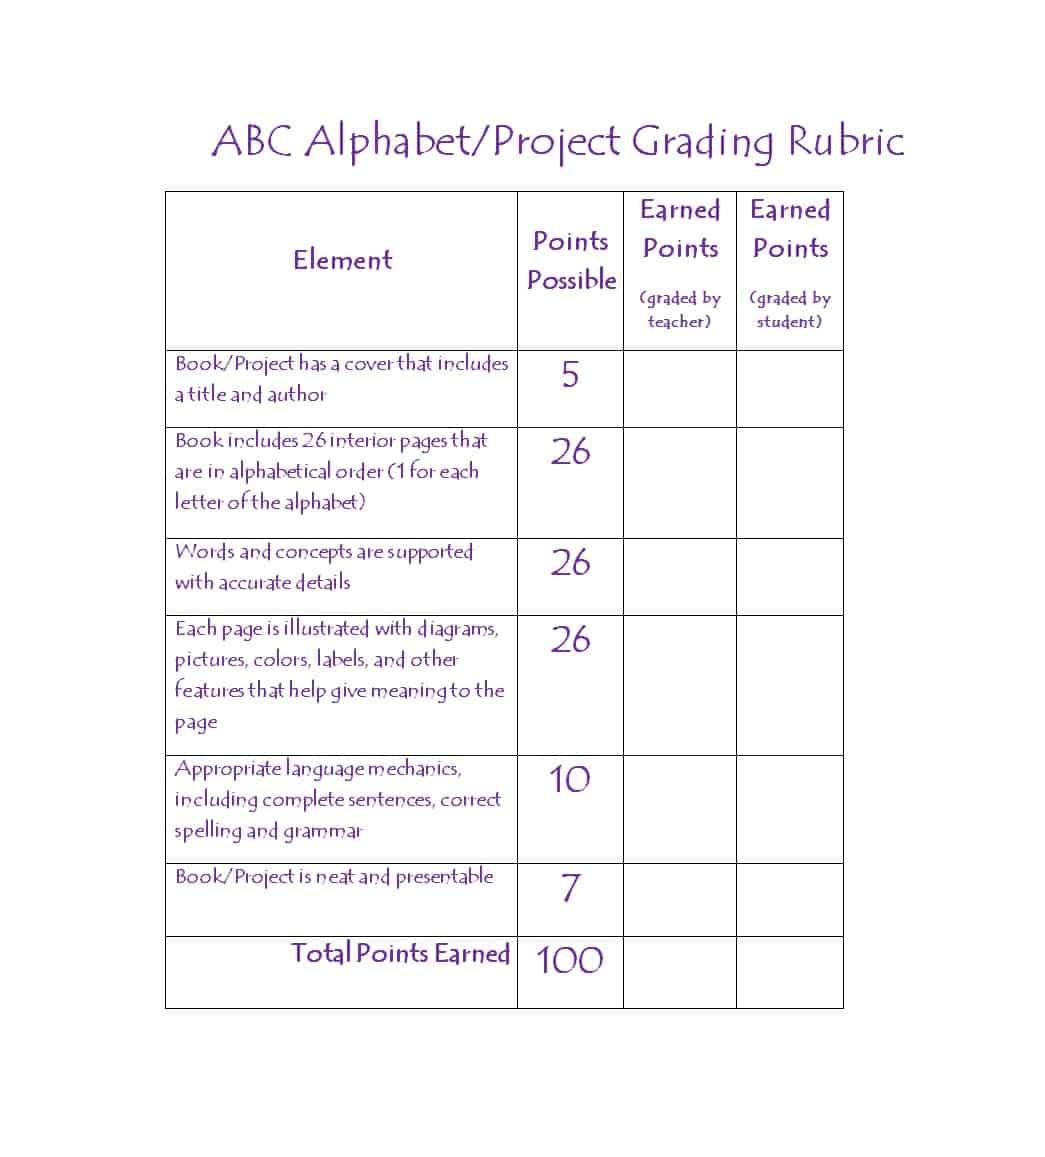 46 Editable Rubric Templates (Word Format) - Template Lab - Free Printable Rubrics For Teachers